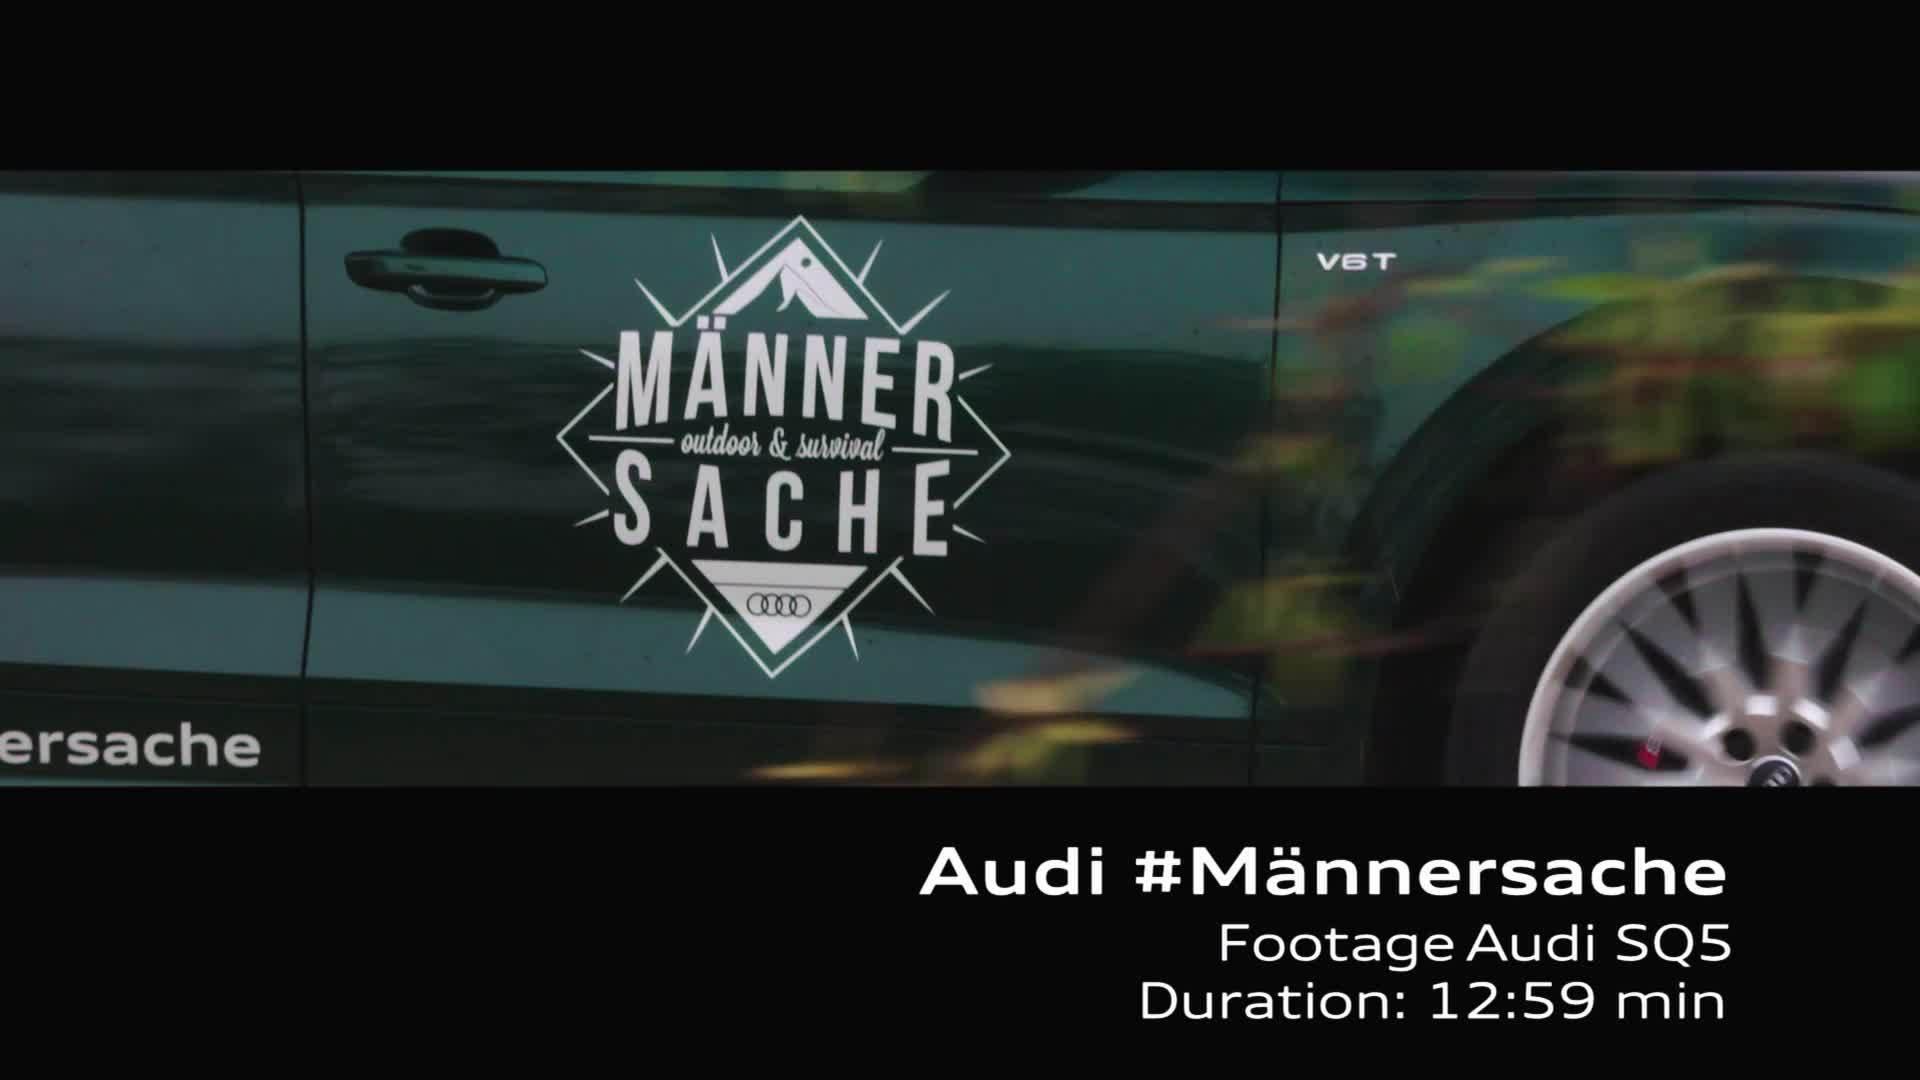 Footage - Audi SQ5 #Männersache